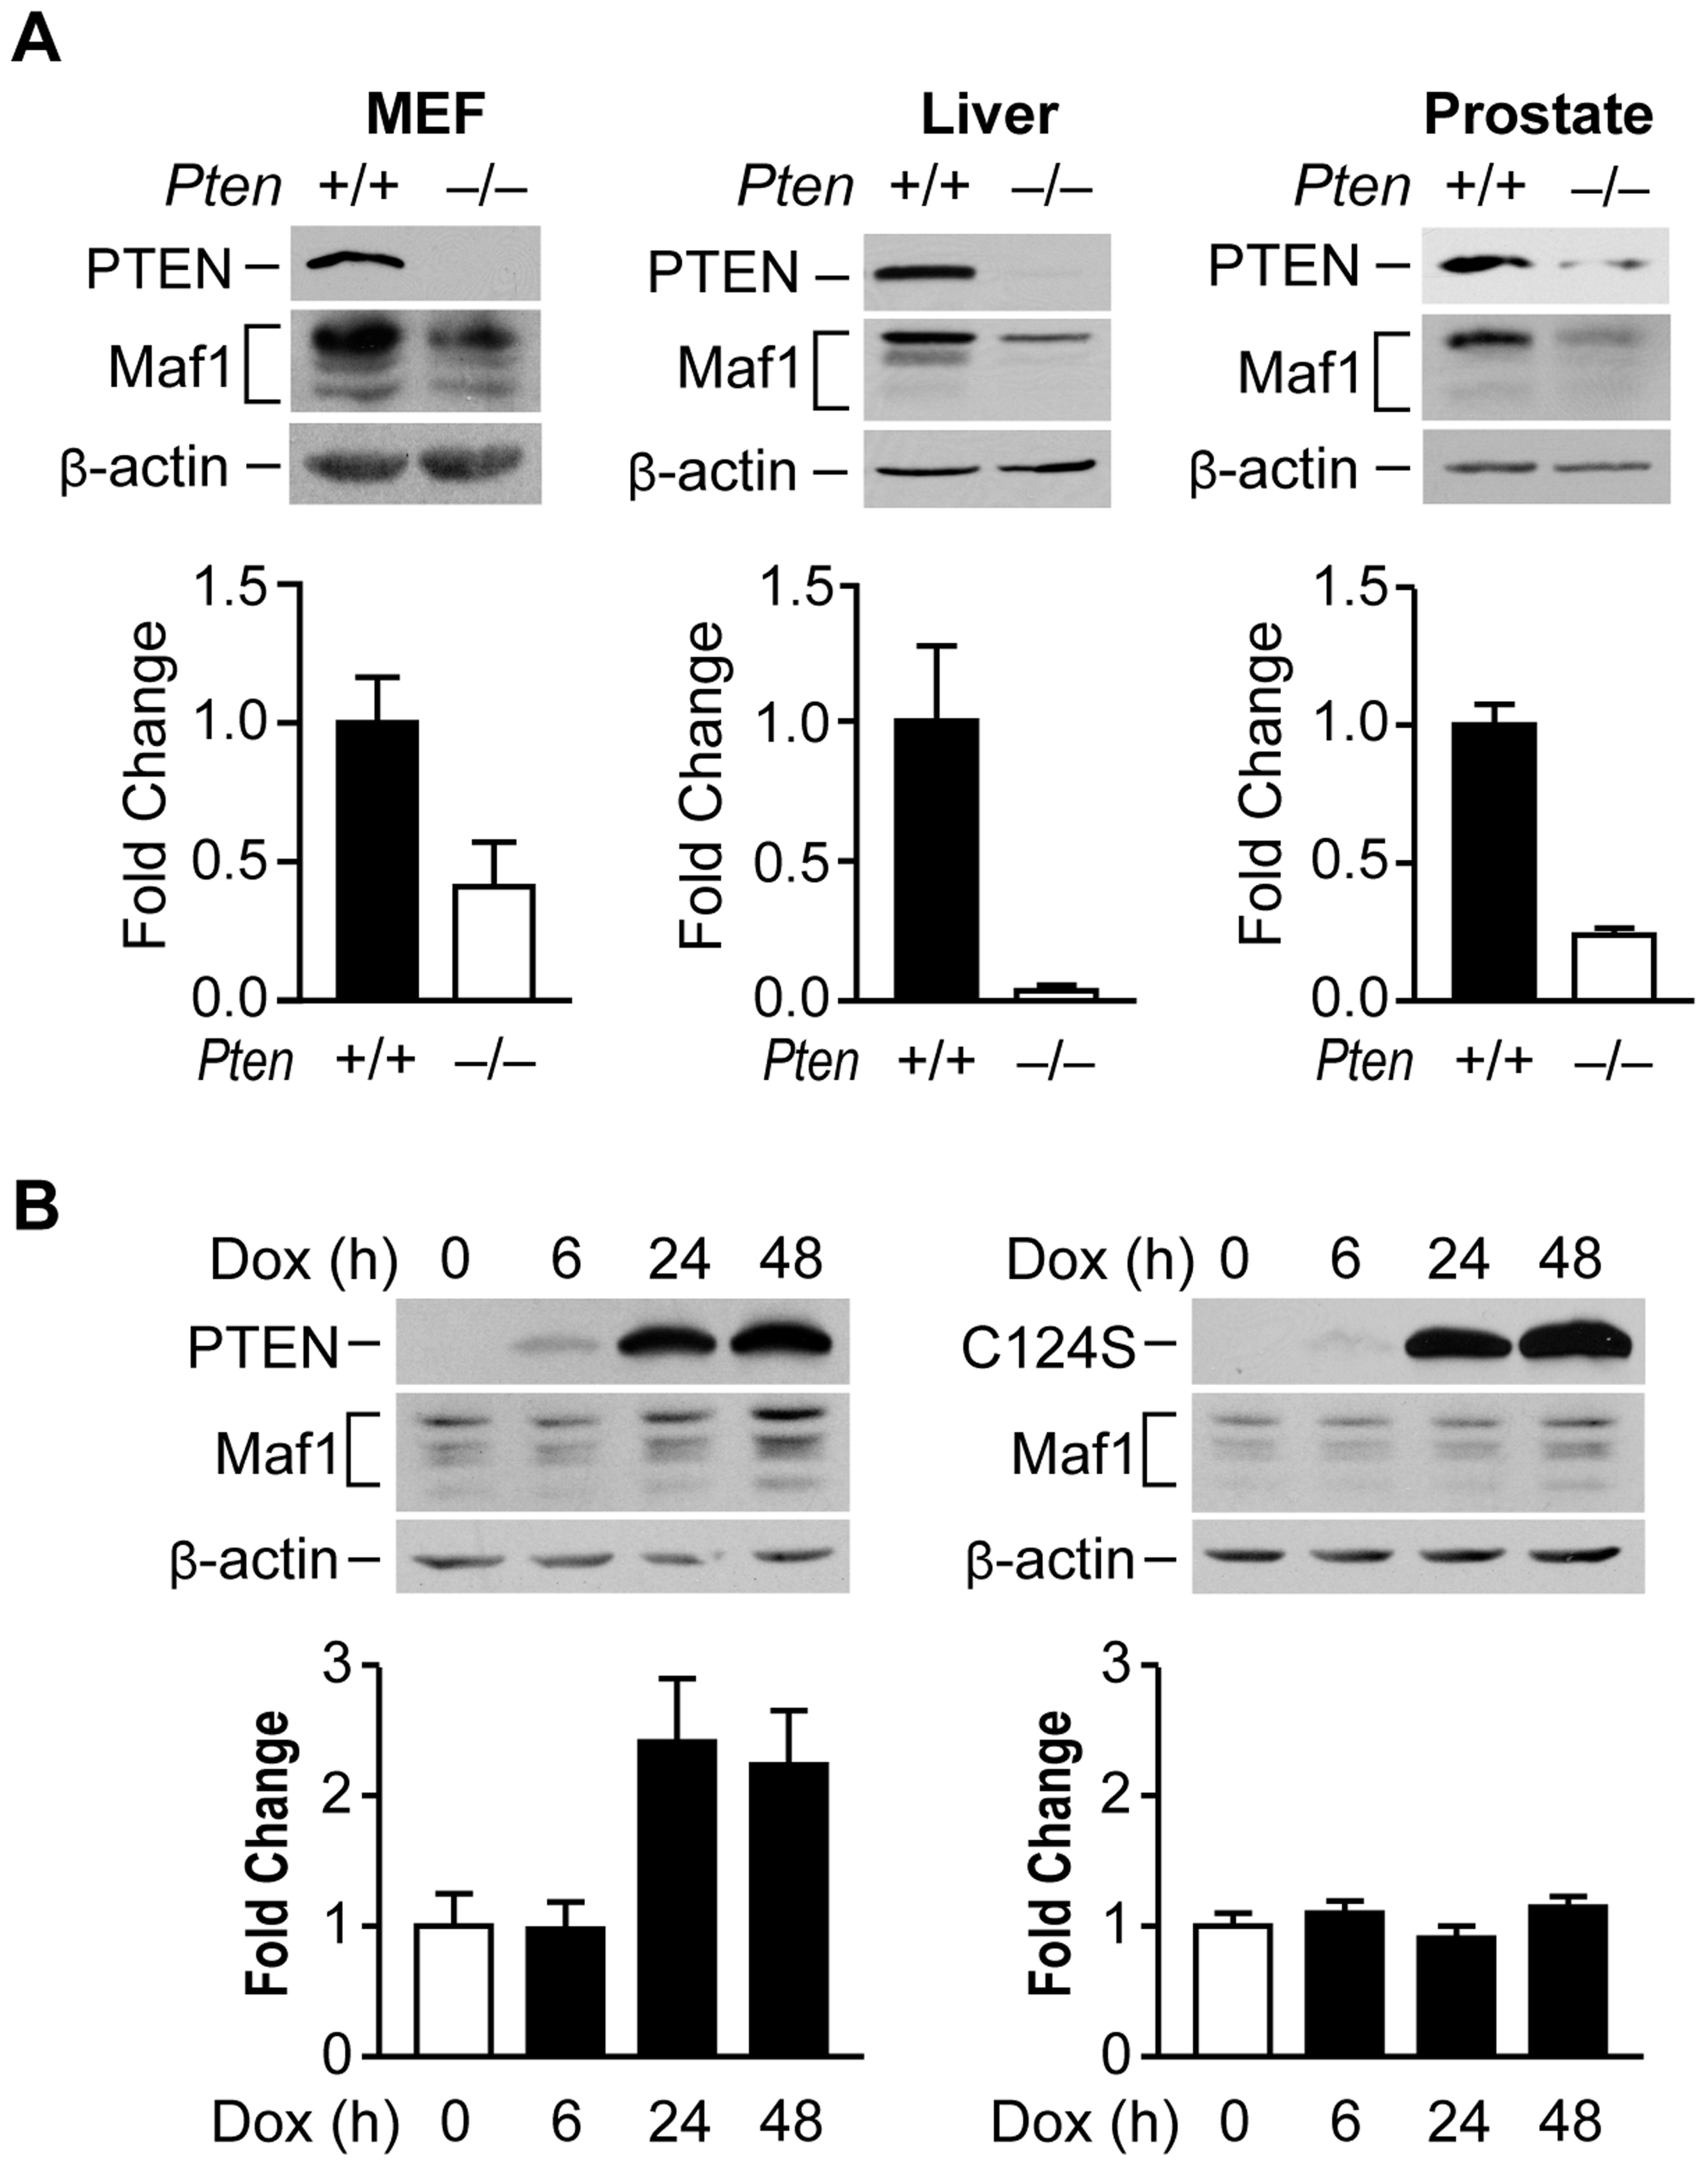 PTEN regulates Maf1 protein expression.